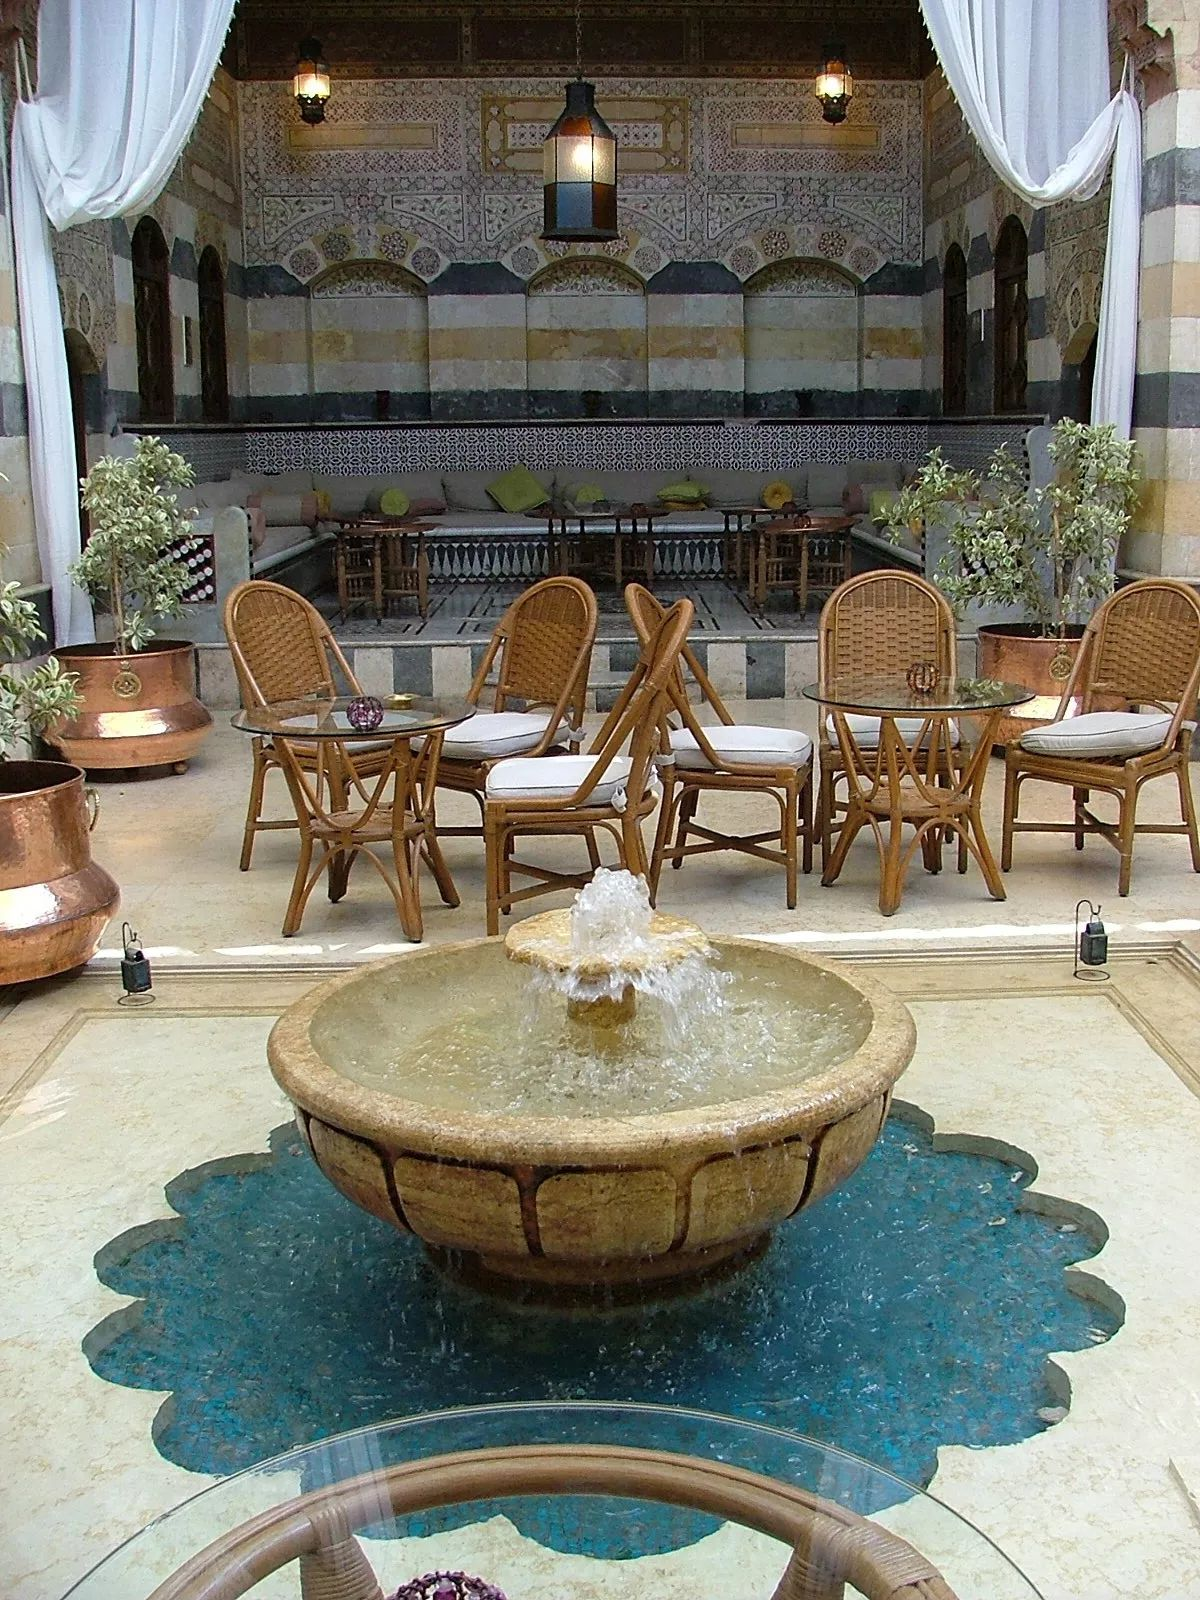 hotel courtyard damascus syria Luxury adventure, Luxury